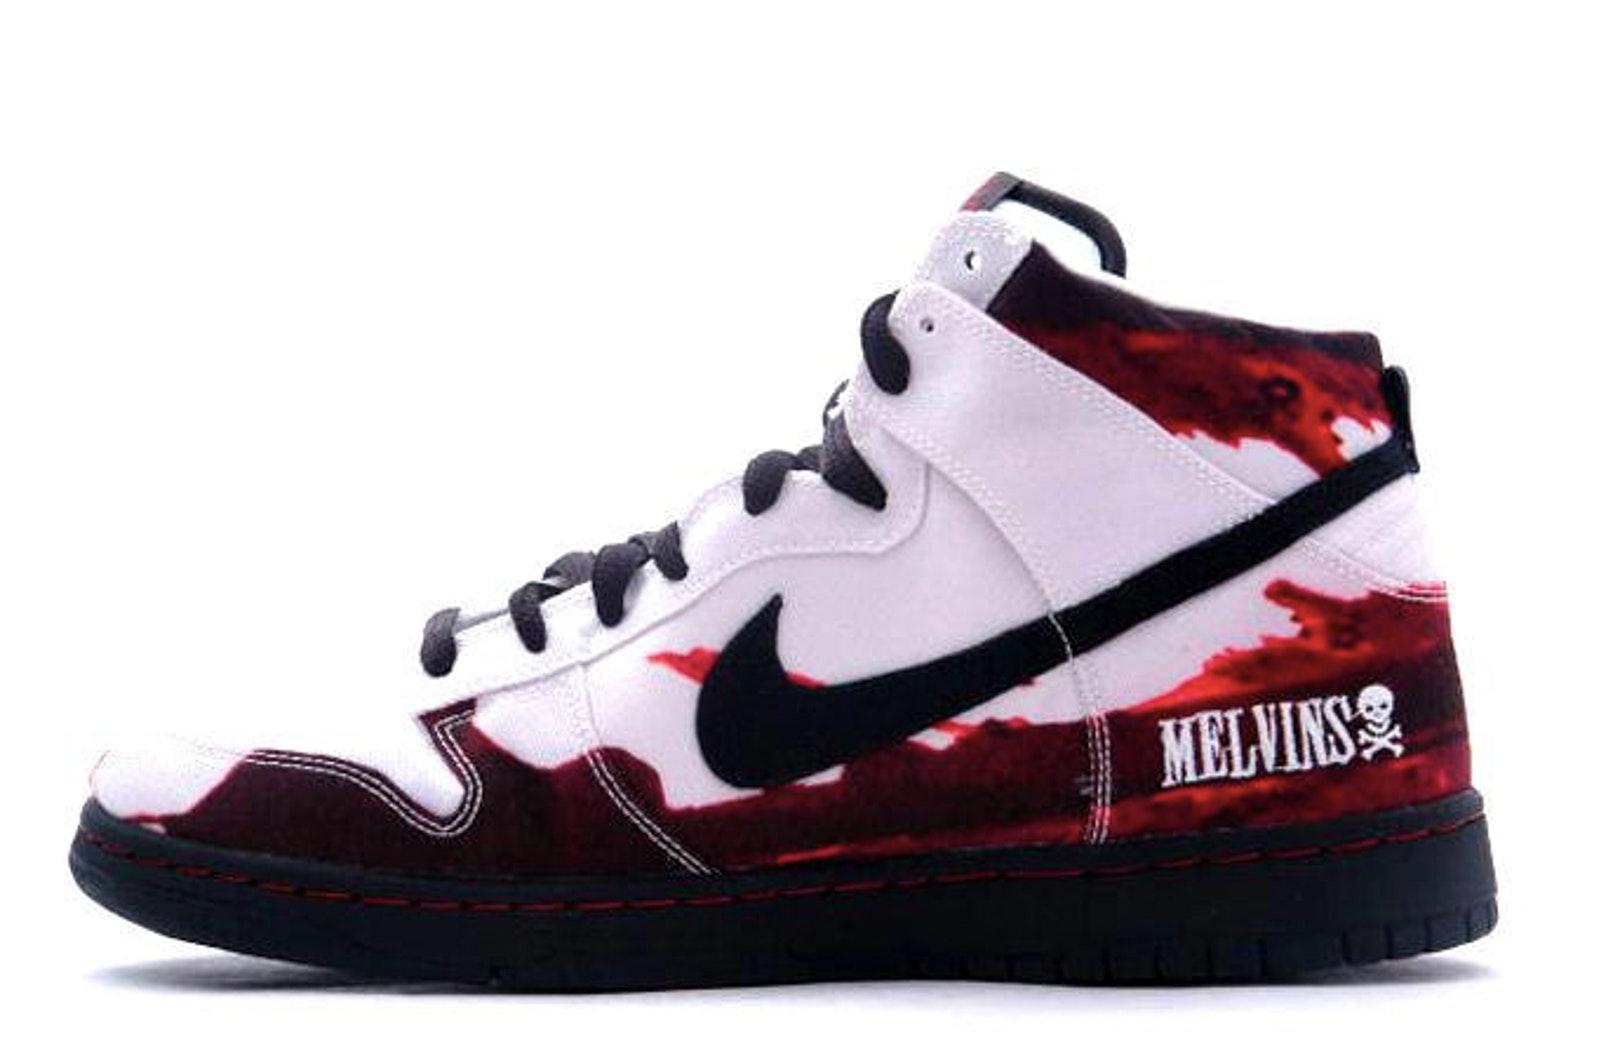 Nike Dunk High Melvin White